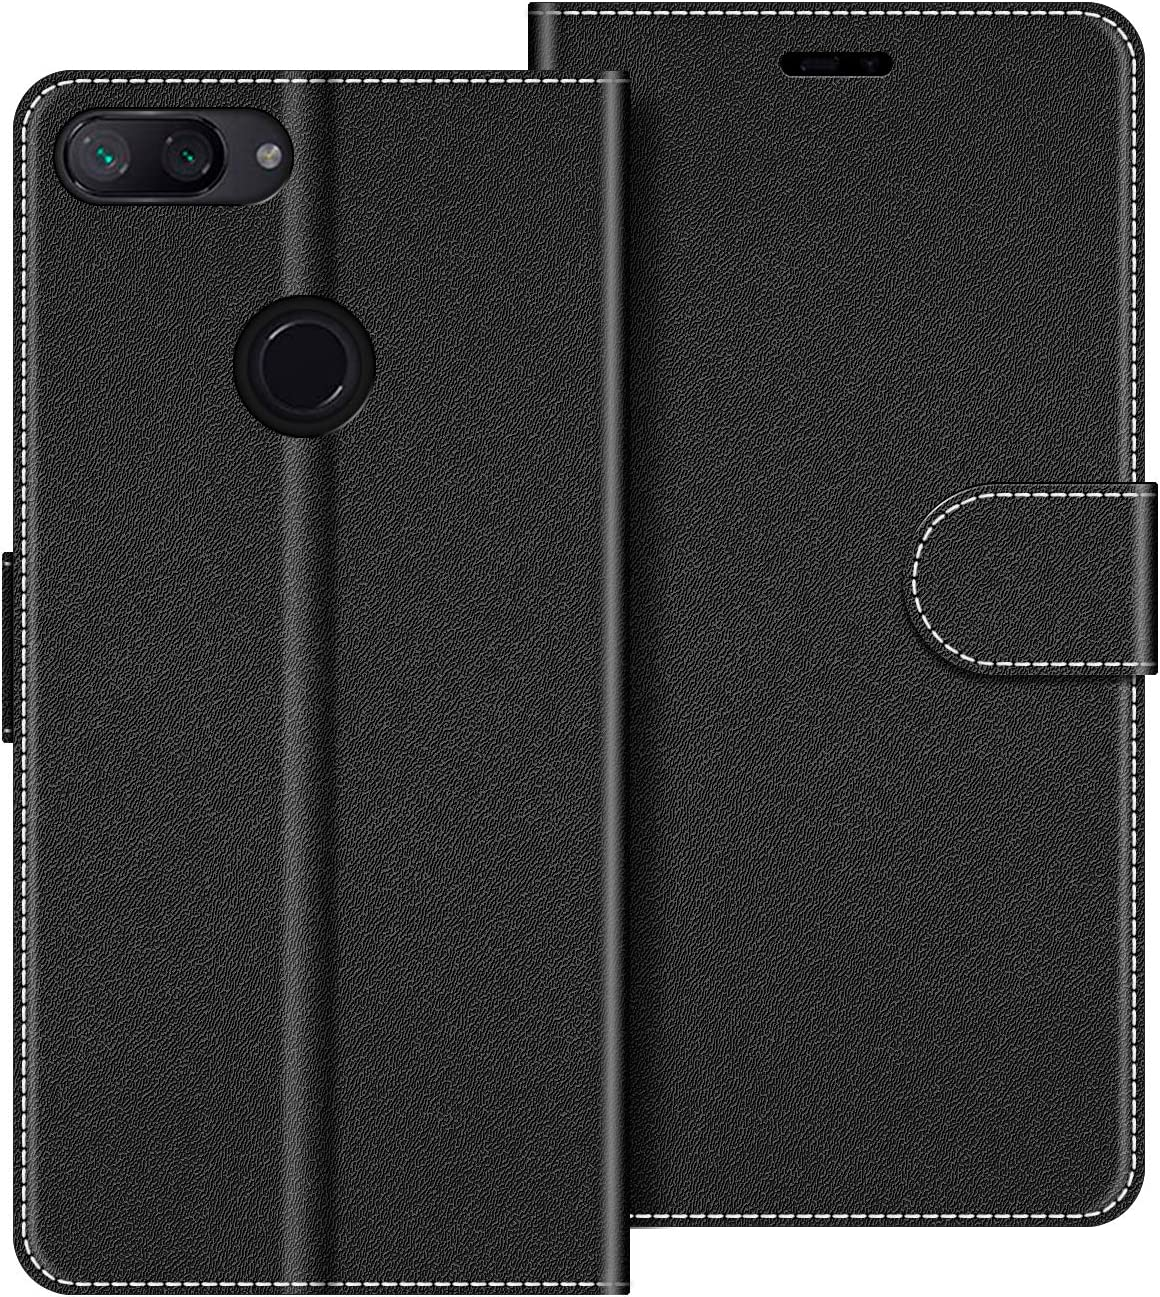 COODIO Funda Xiaomi Mi 8 Lite con Tapa, Funda Movil Xiaomi Mi 8 Lite, Funda Libro Xiaomi Mi 8 Lite Carcasa Magnético Funda para Xiaomi Mi 8 Lite, Negro